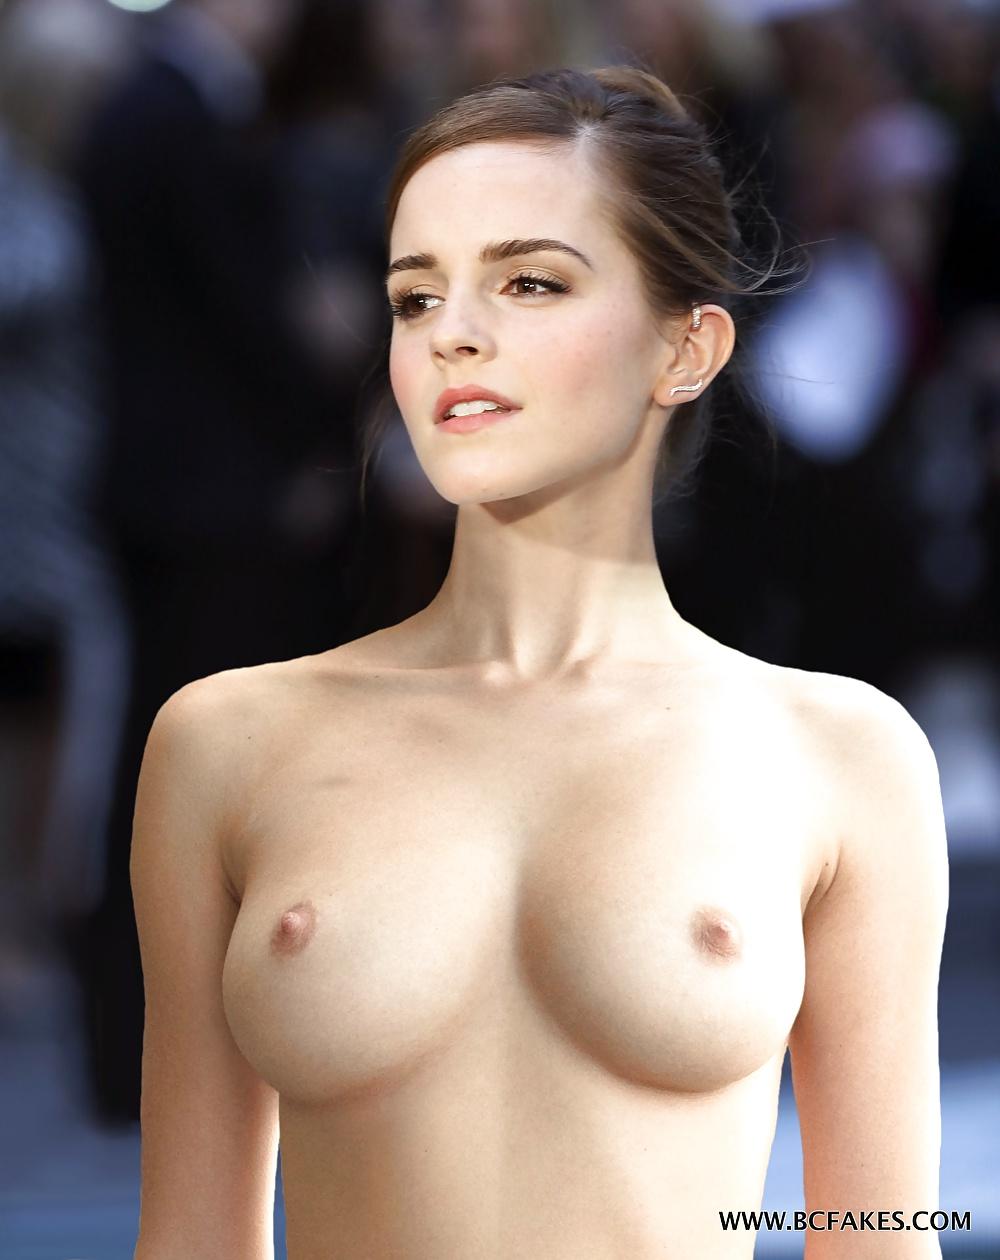 Emma watson topless pic